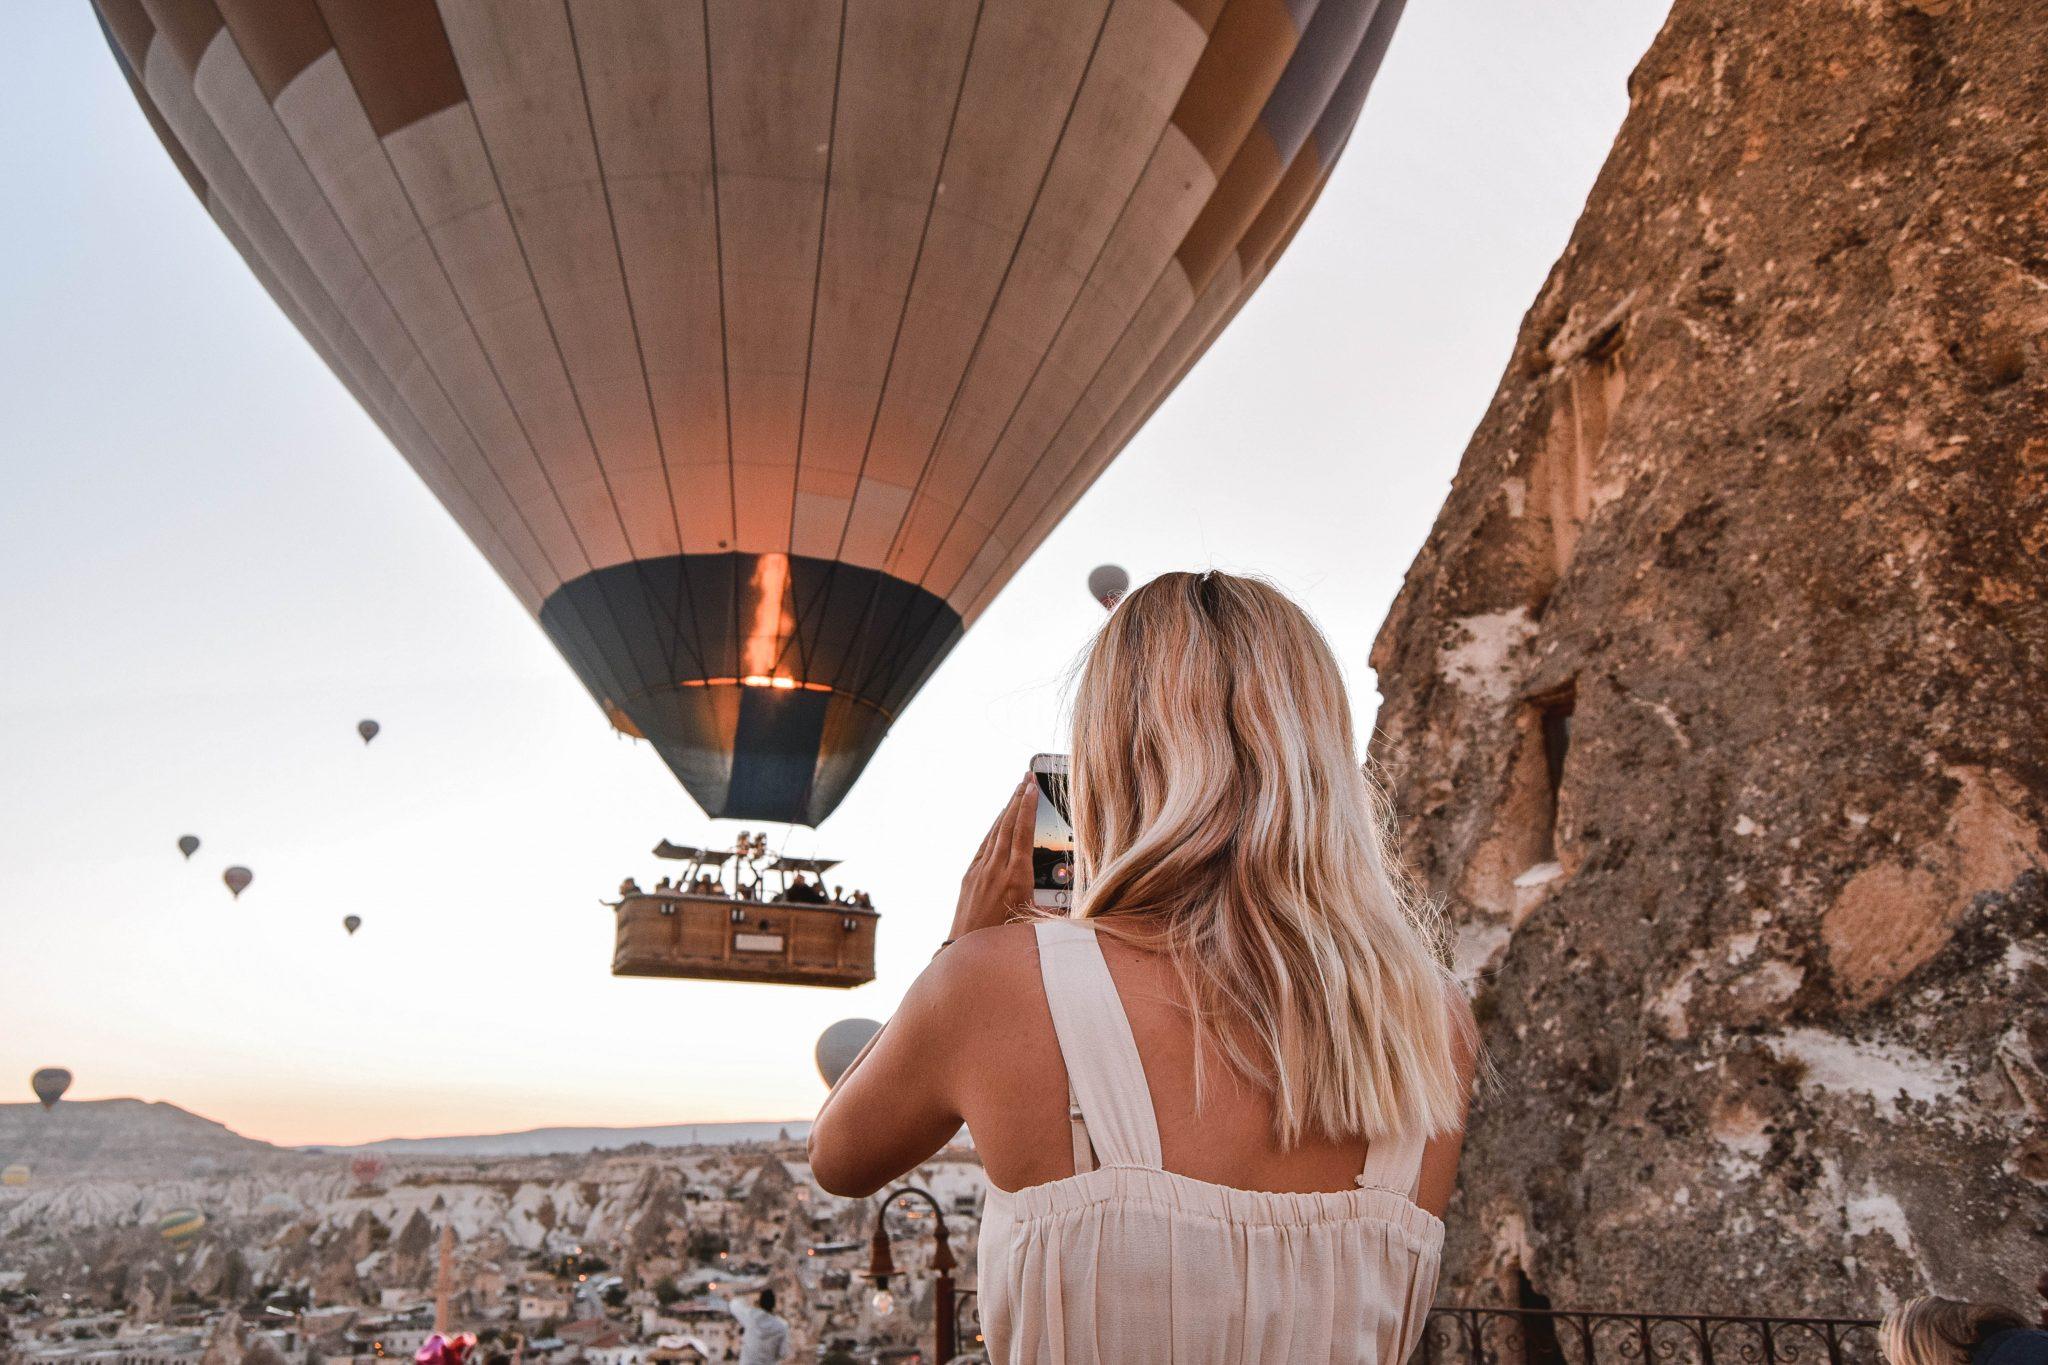 Wanderers & Warriors - Charlie & Lauren UK Travel Couple - Things To Do In Cappadocia Hot Air Ballon Tour Cappadocia